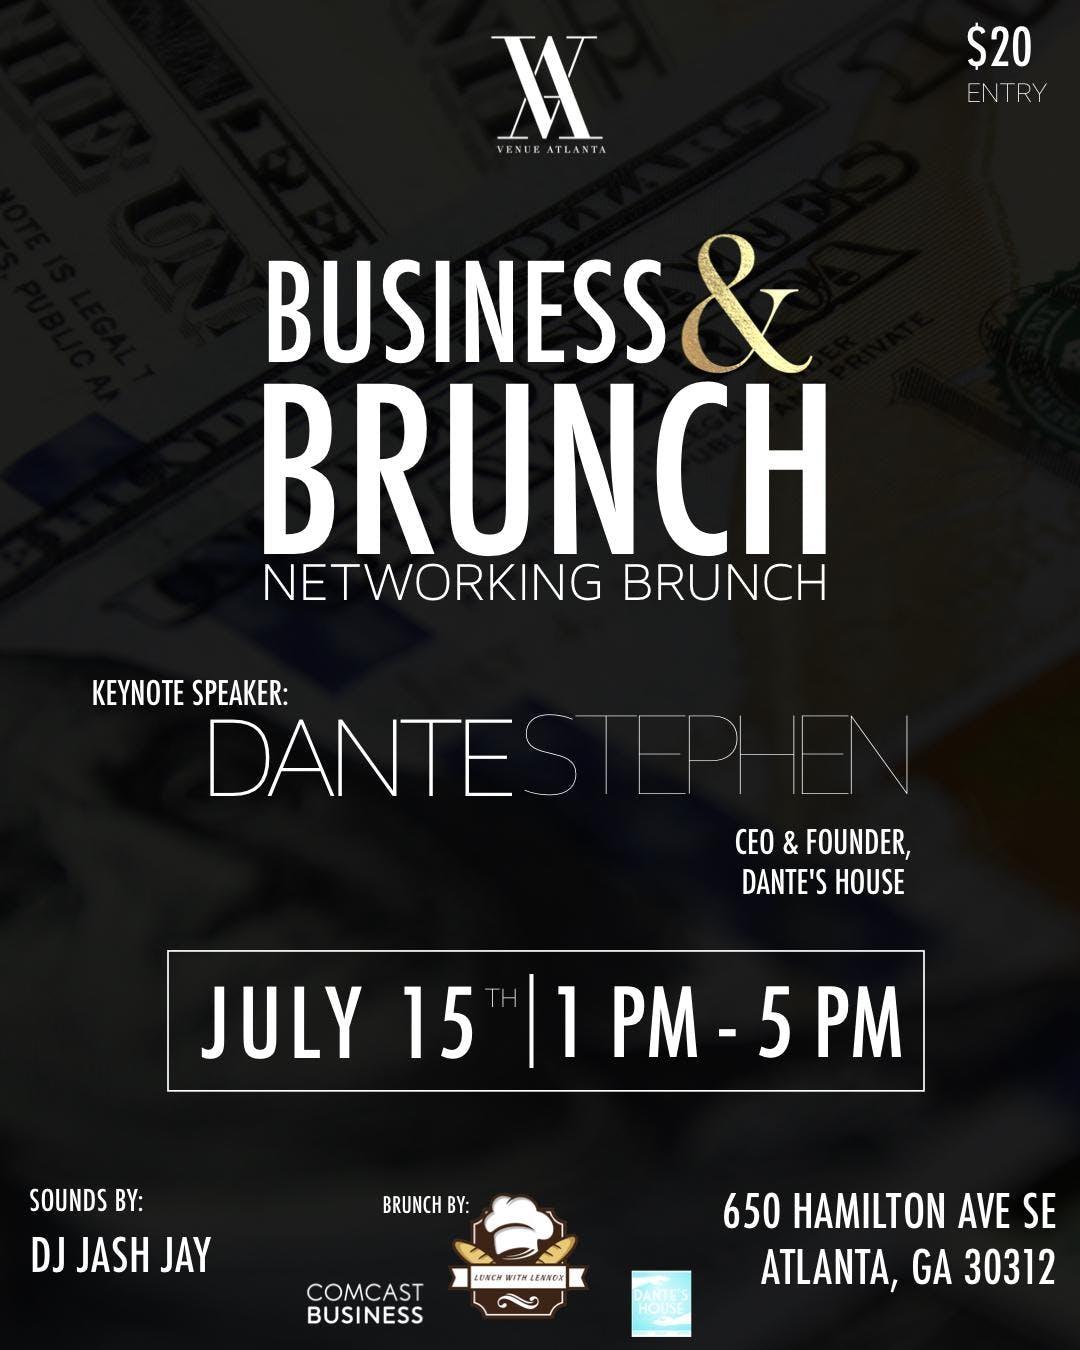 Business Cards & Brunch at 650 Hamilton Ave SE, Atlanta